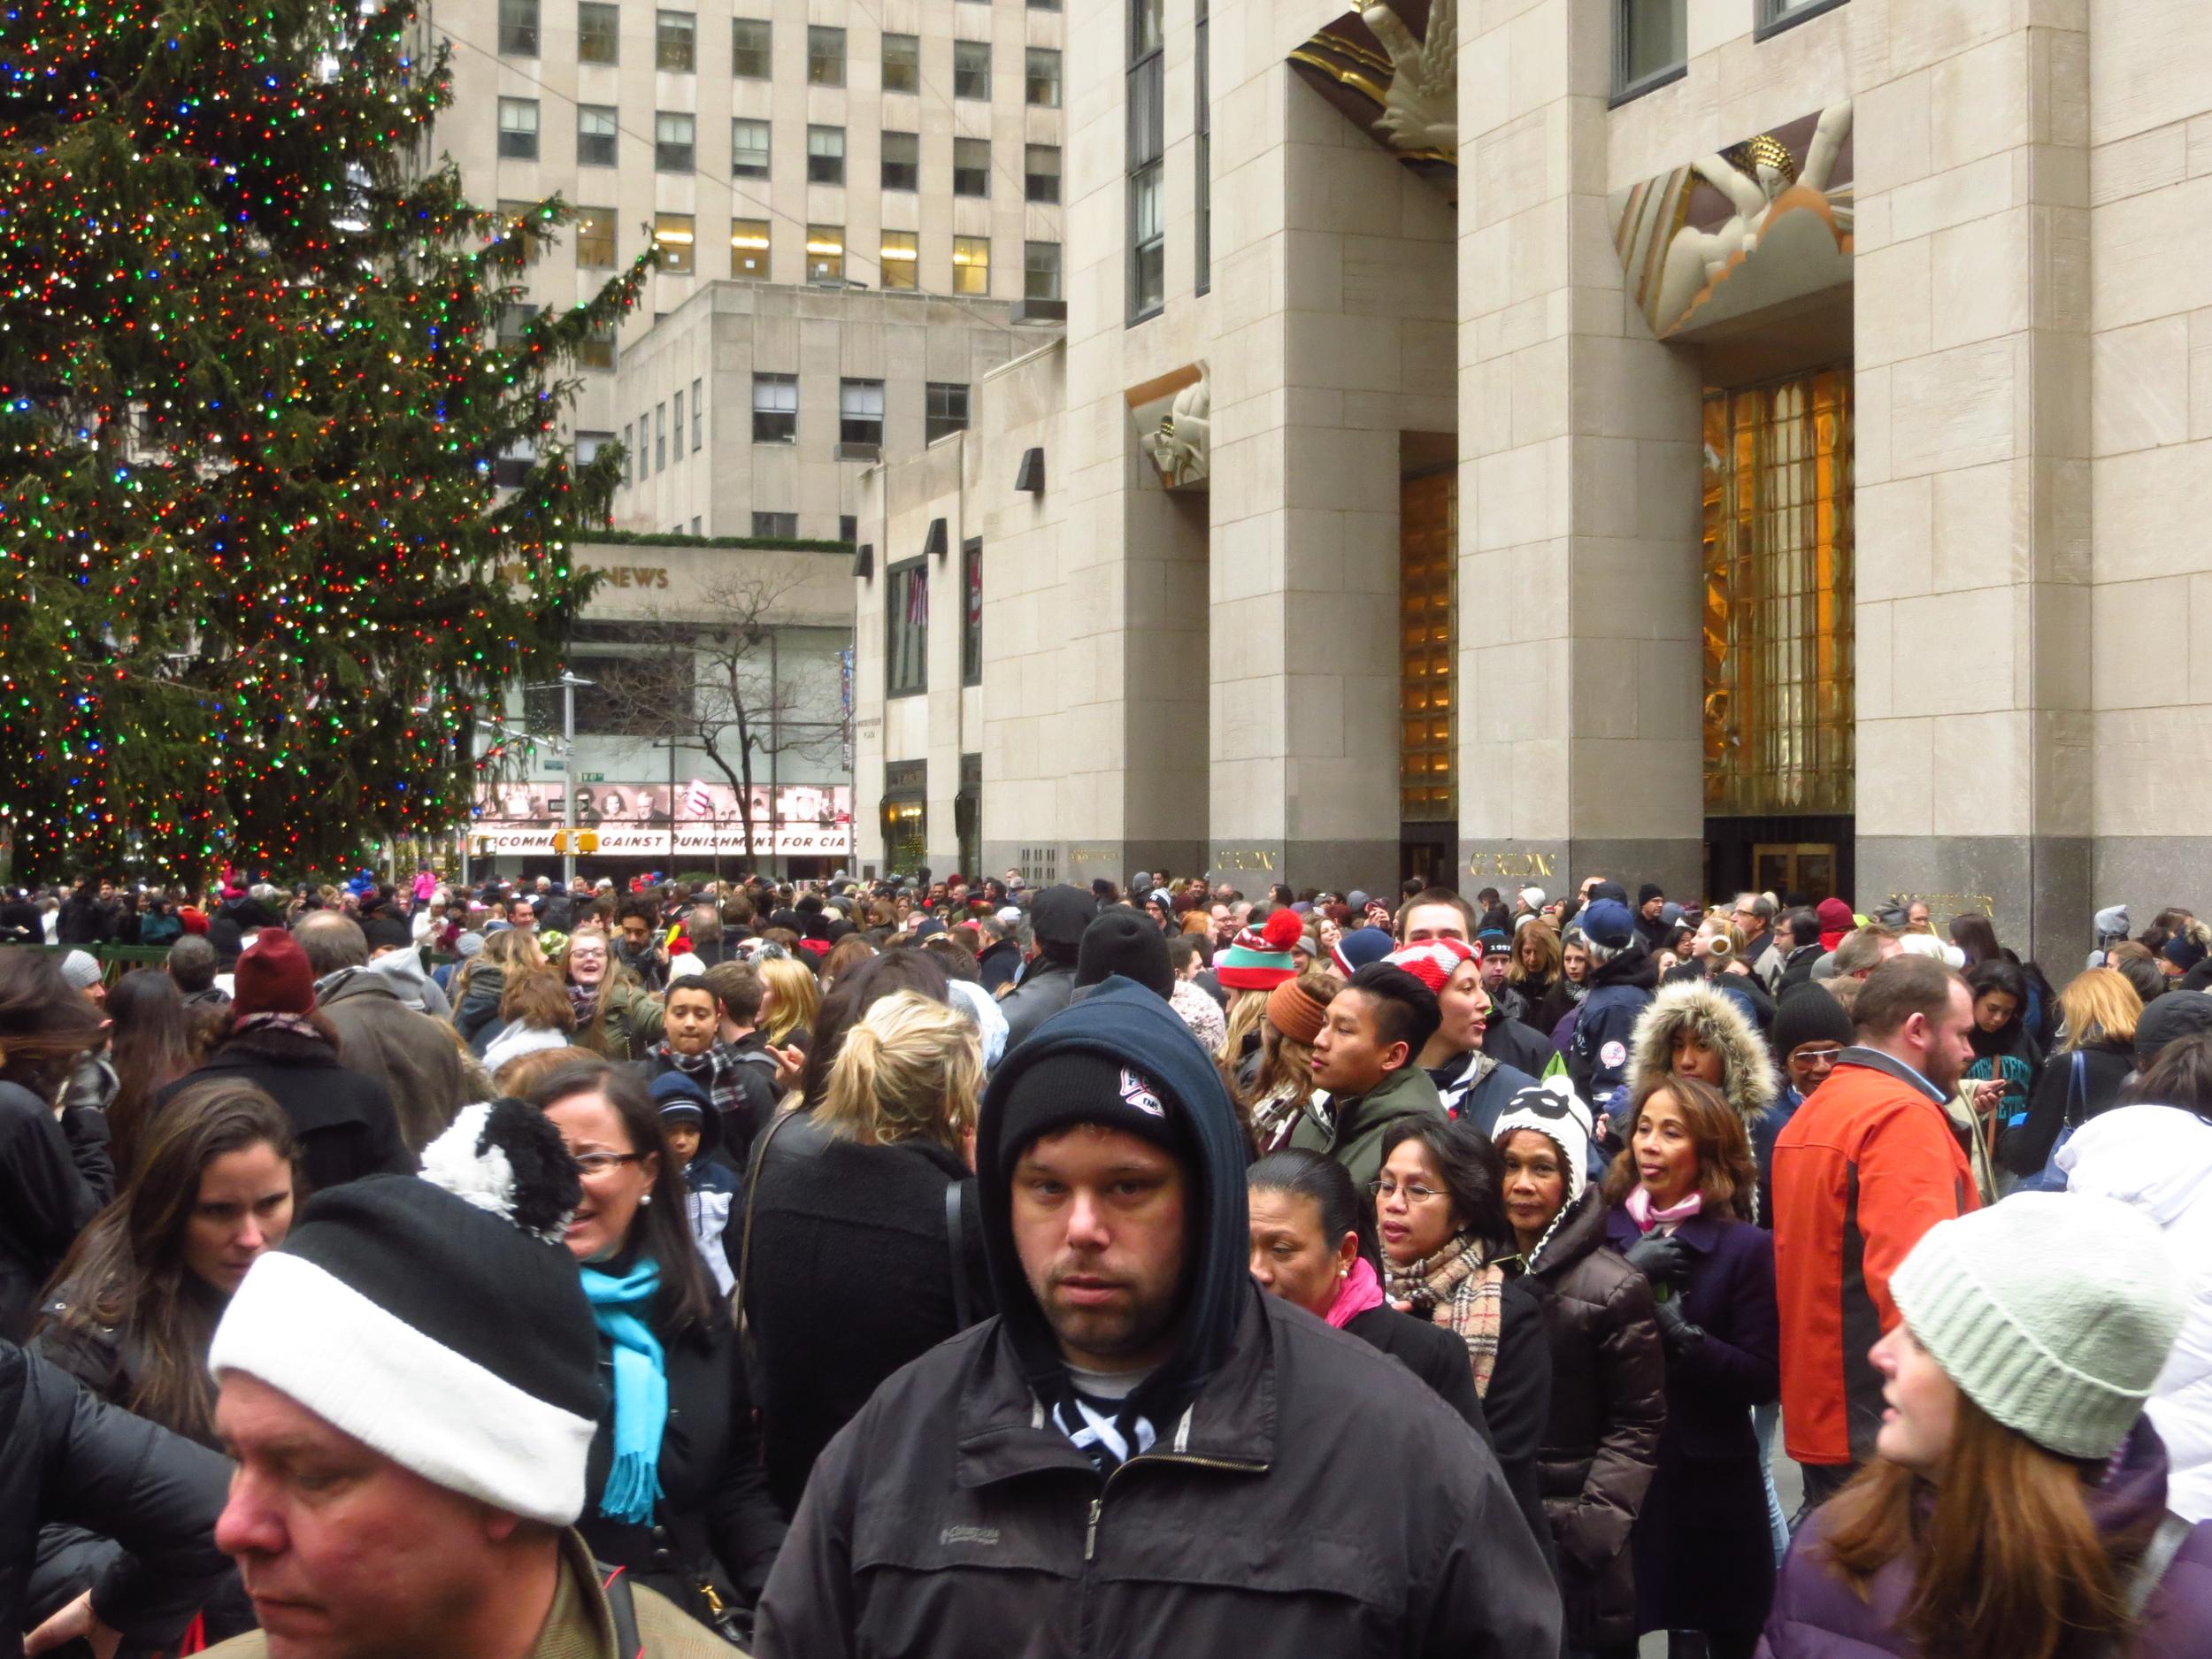 Rockefeller Christmas Tree madness